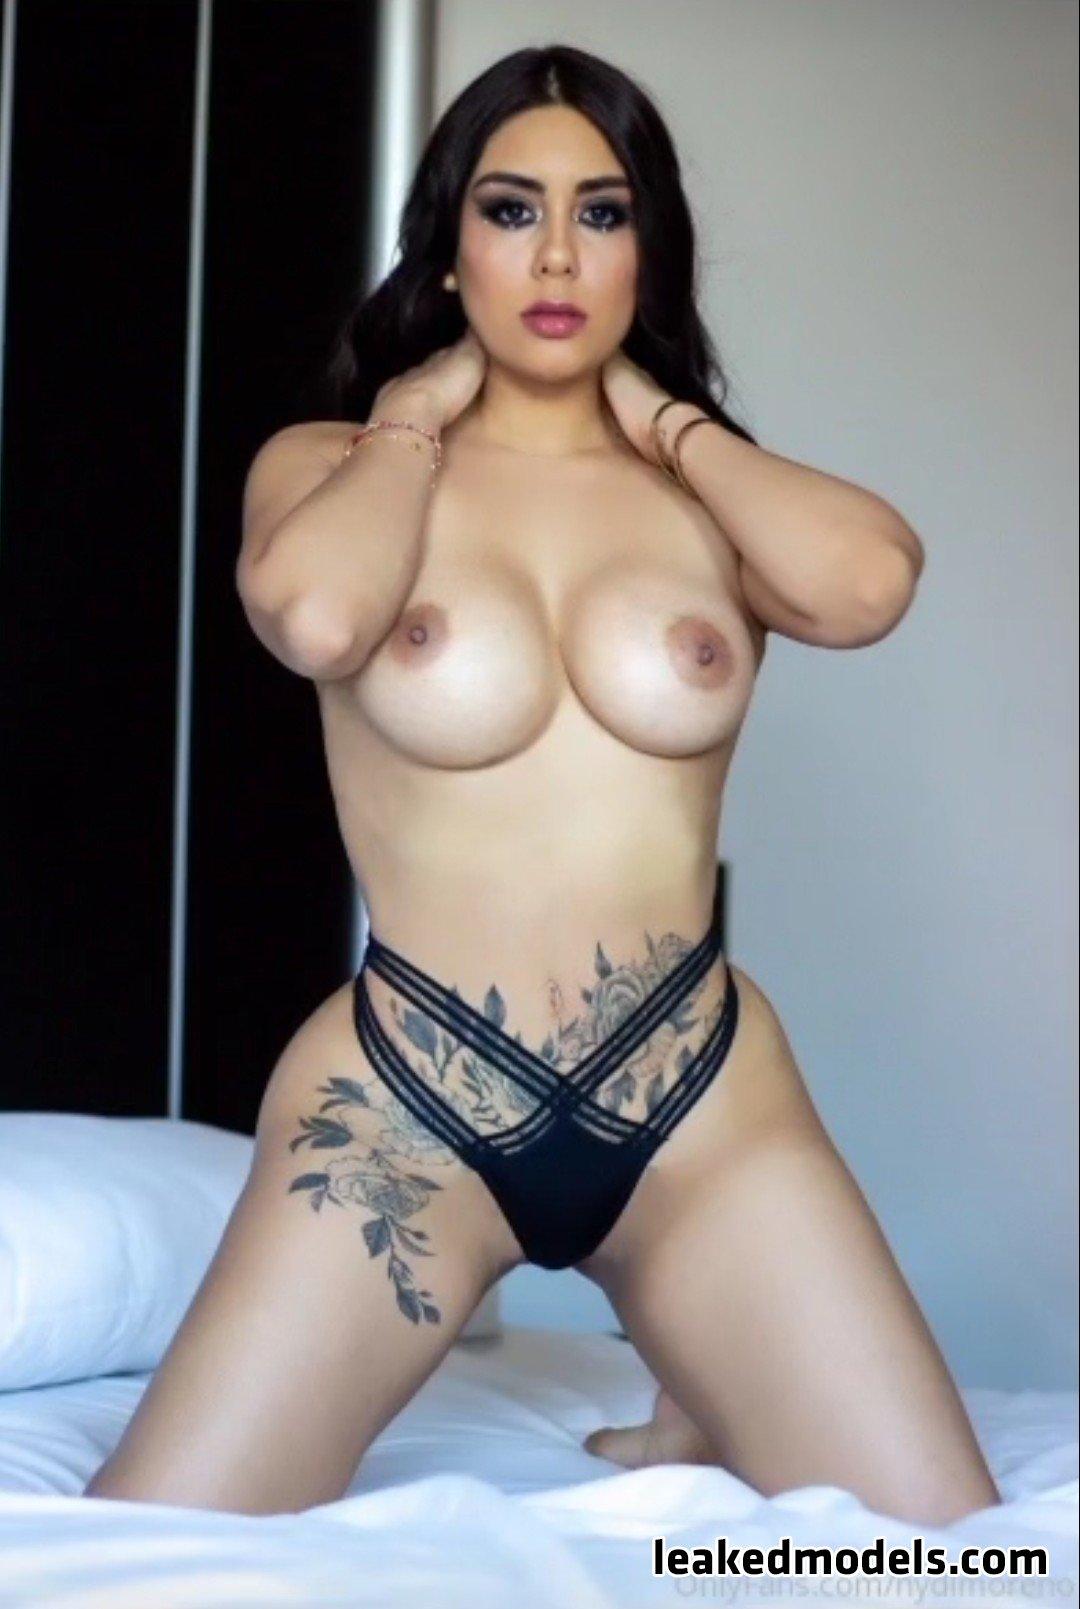 nydimoreno leaked nude leakedmodels.com 0015 - Nydia Moreno – nydimoreno OnlyFans Nude Leaks (25 Photos)